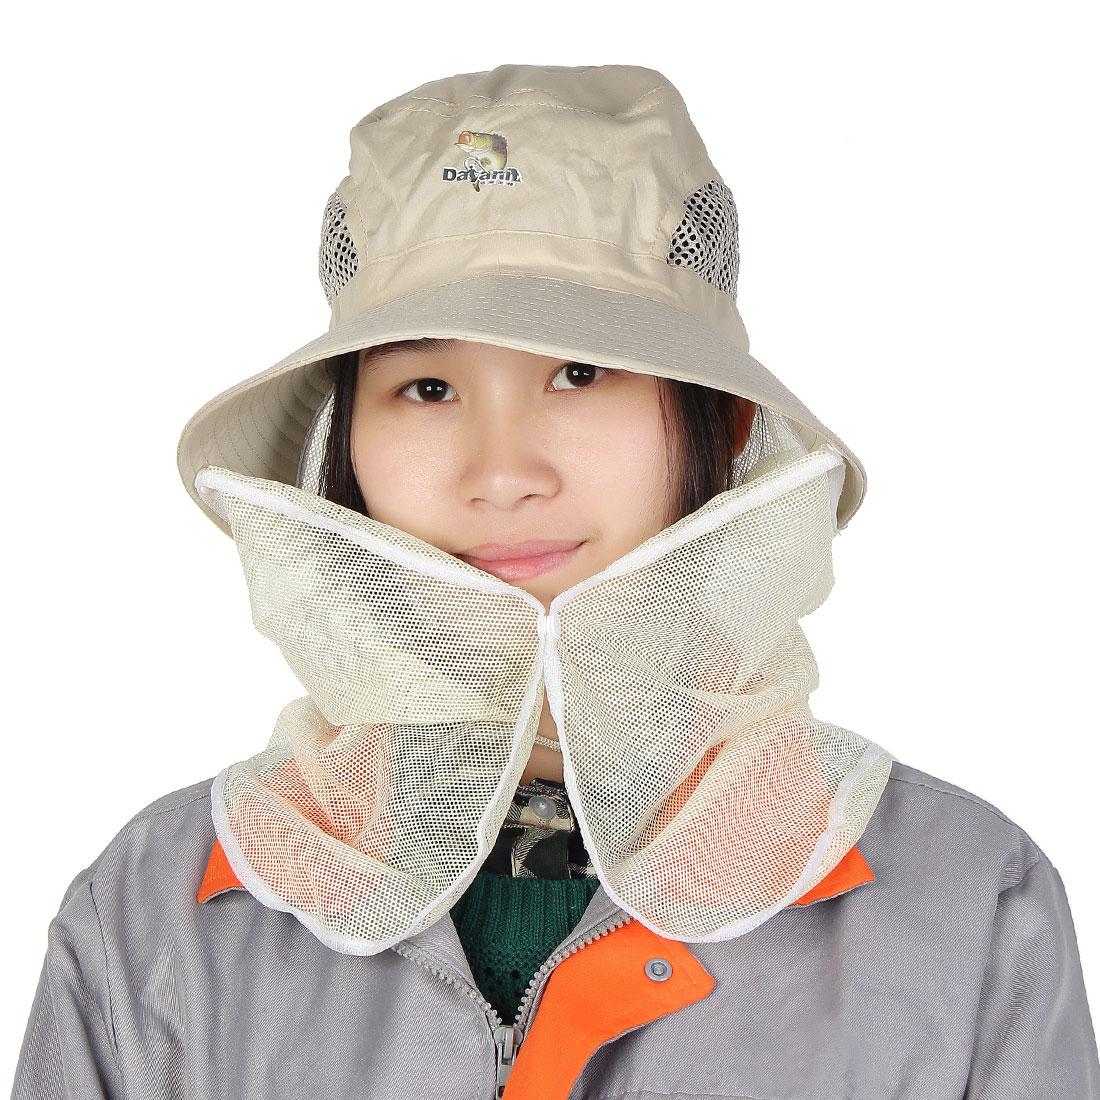 Adjustable Neck Strap Beige Rim Mesh Flap Wide Visor Bucket Style Hat